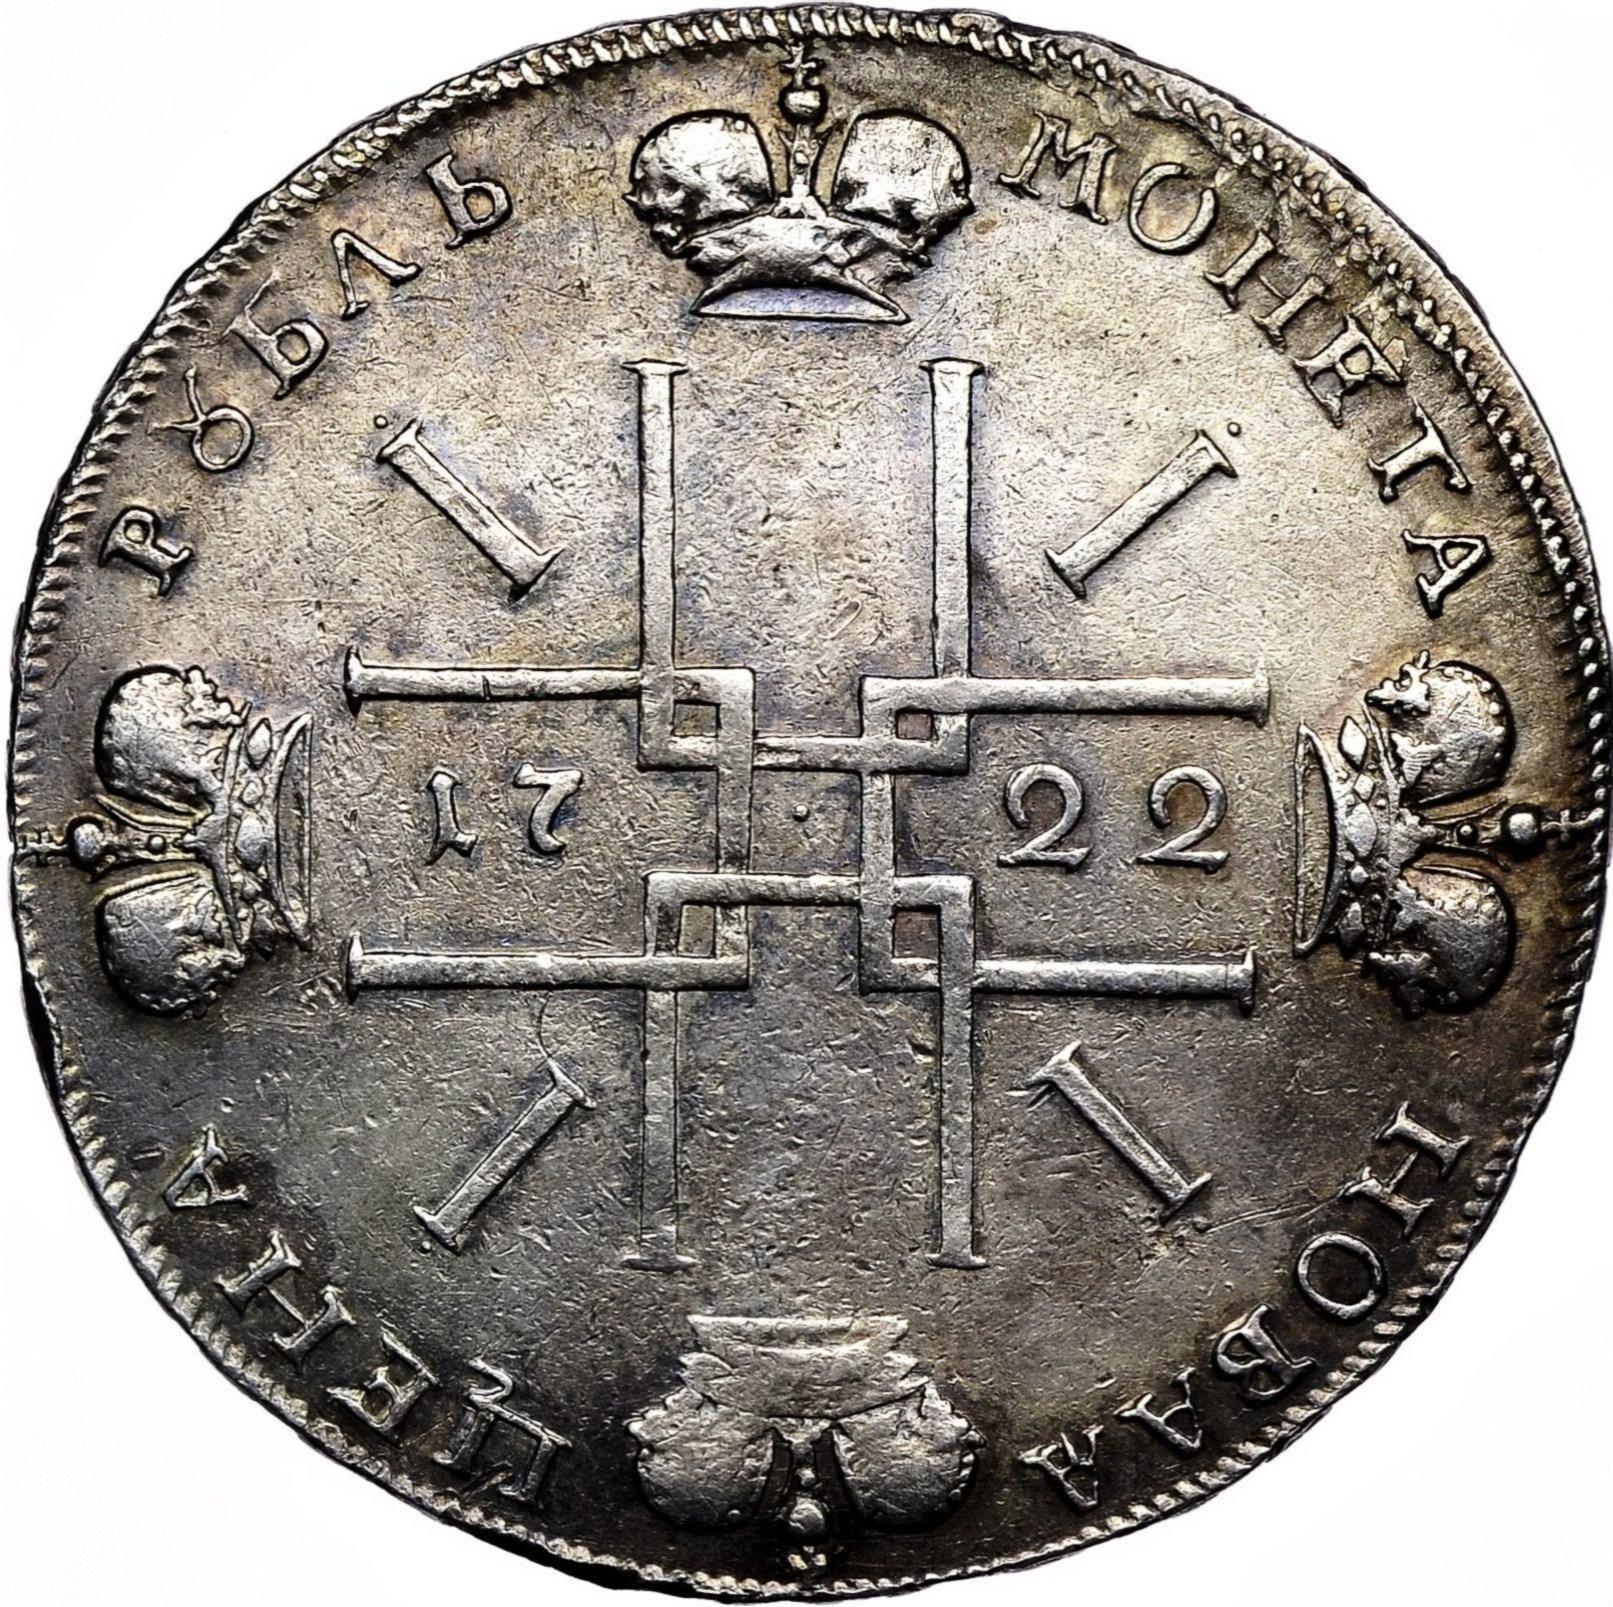 Серебро рубль монета новая цена 1722 года